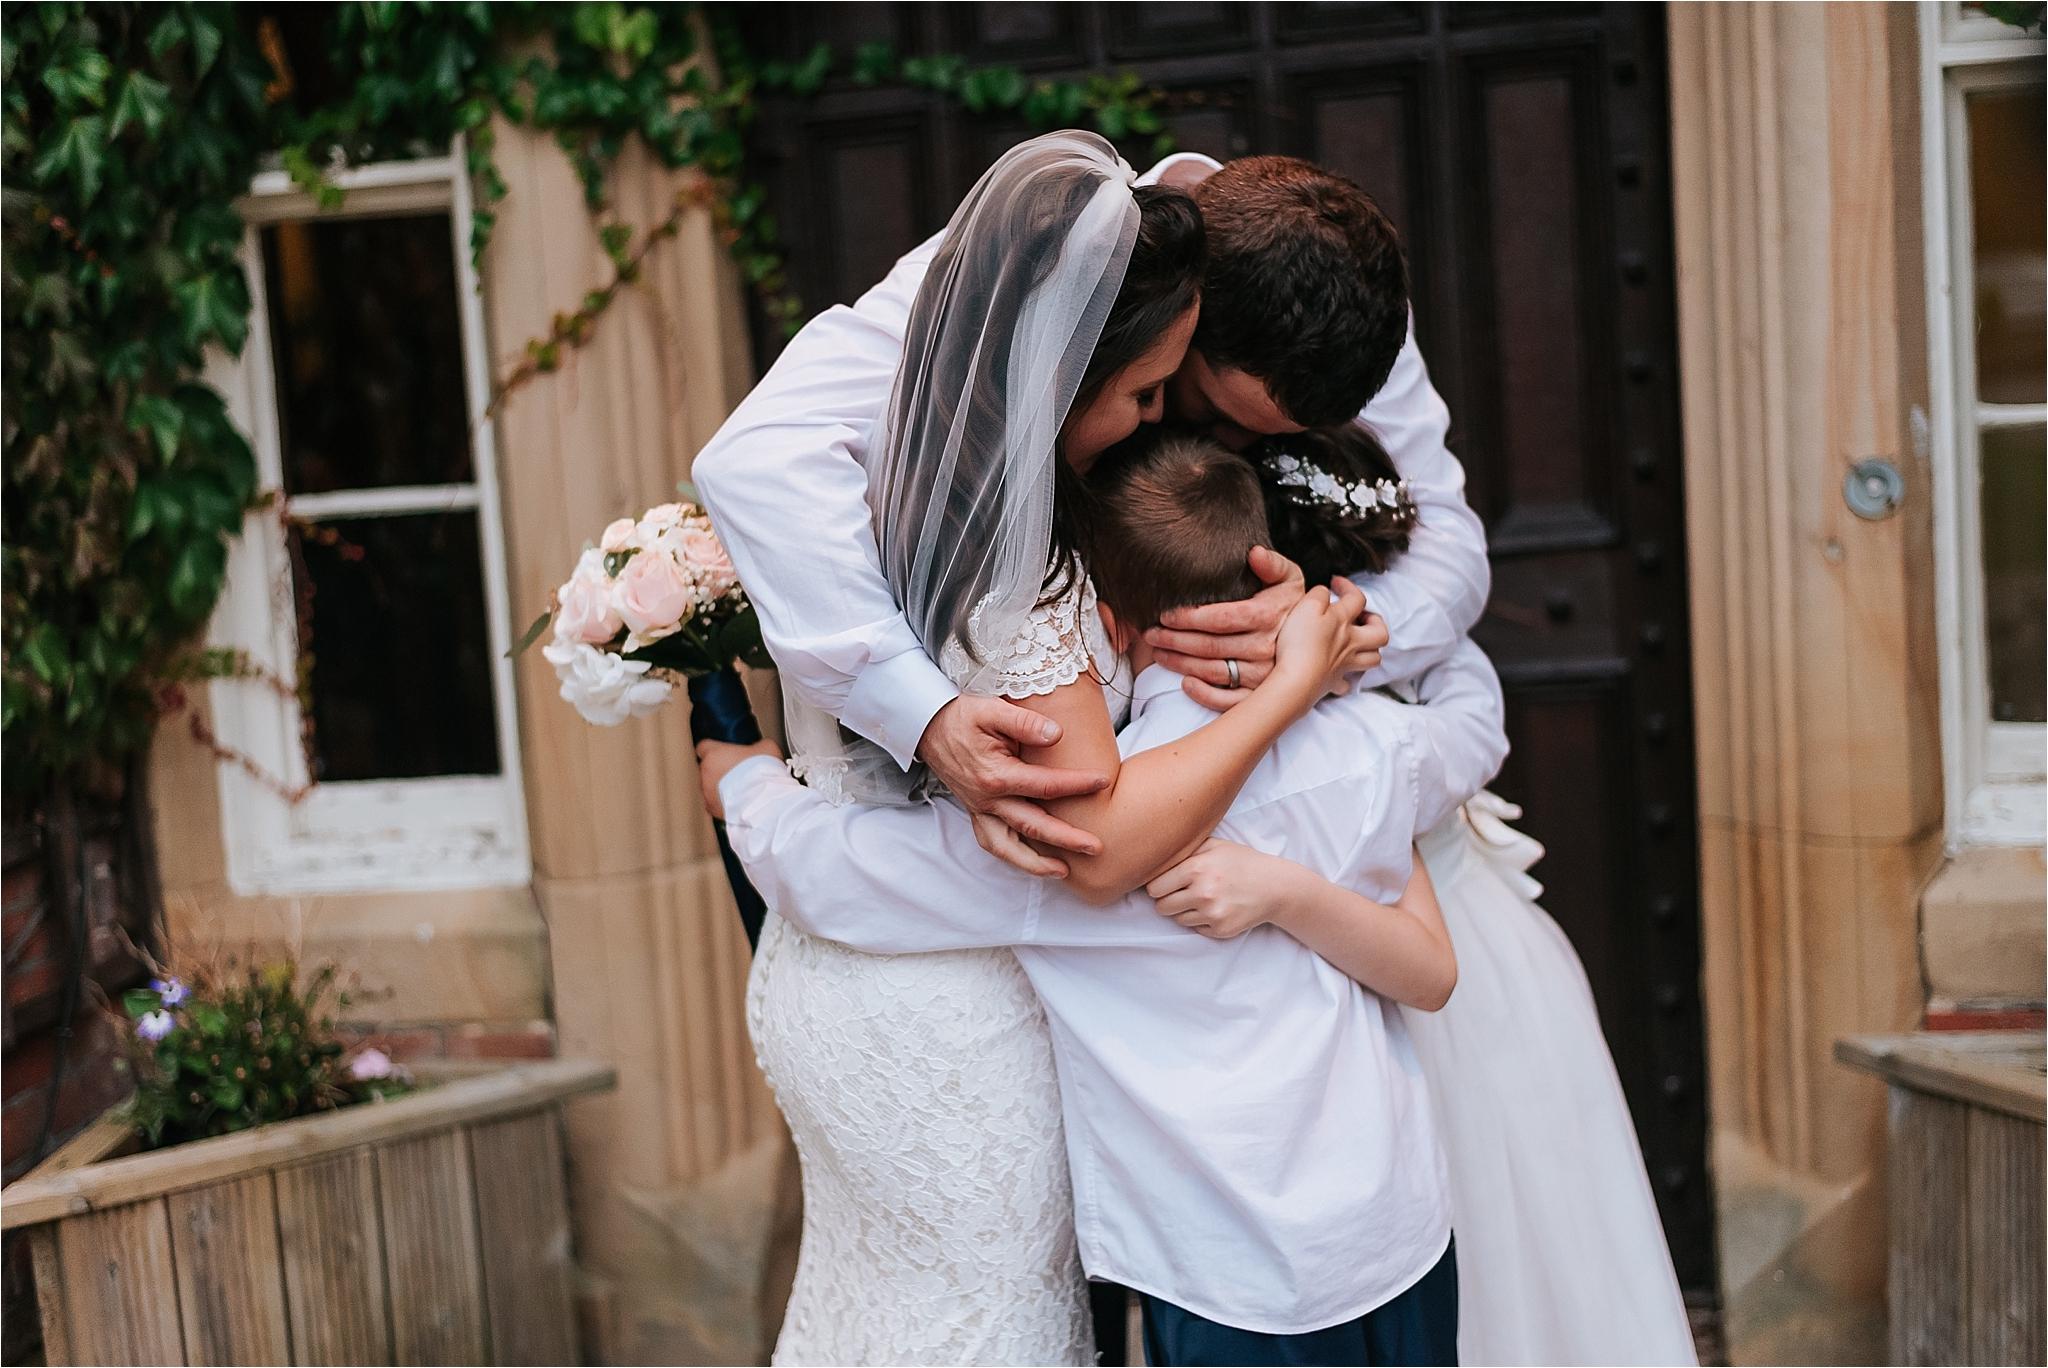 thevilla+lancashire+wreagreen+wedding+photographer69.jpg